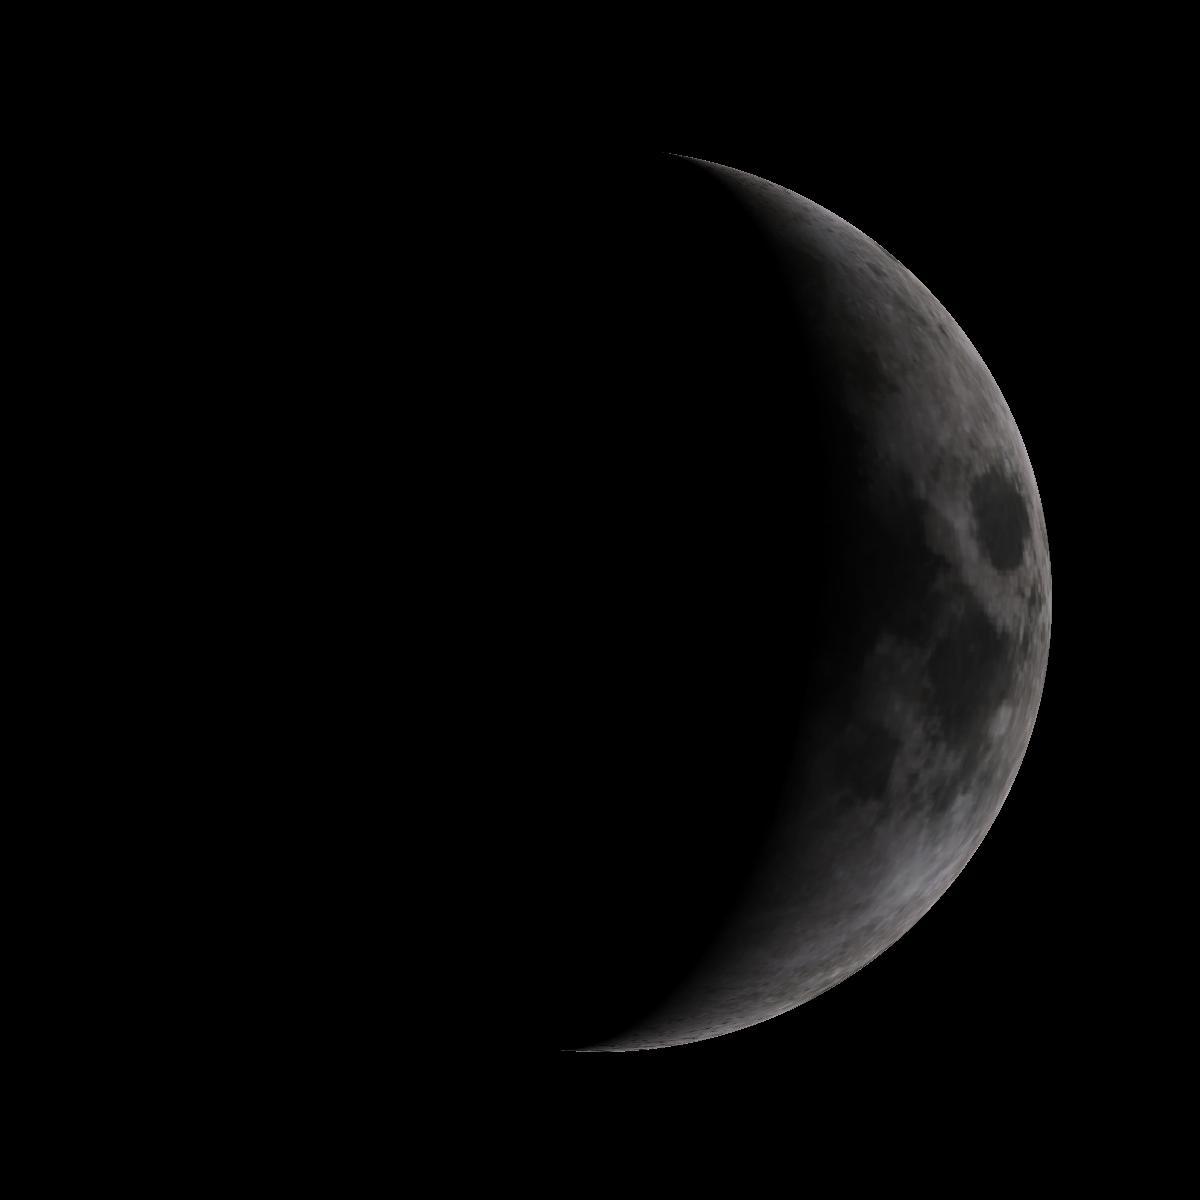 Lune du 30 mars 2020